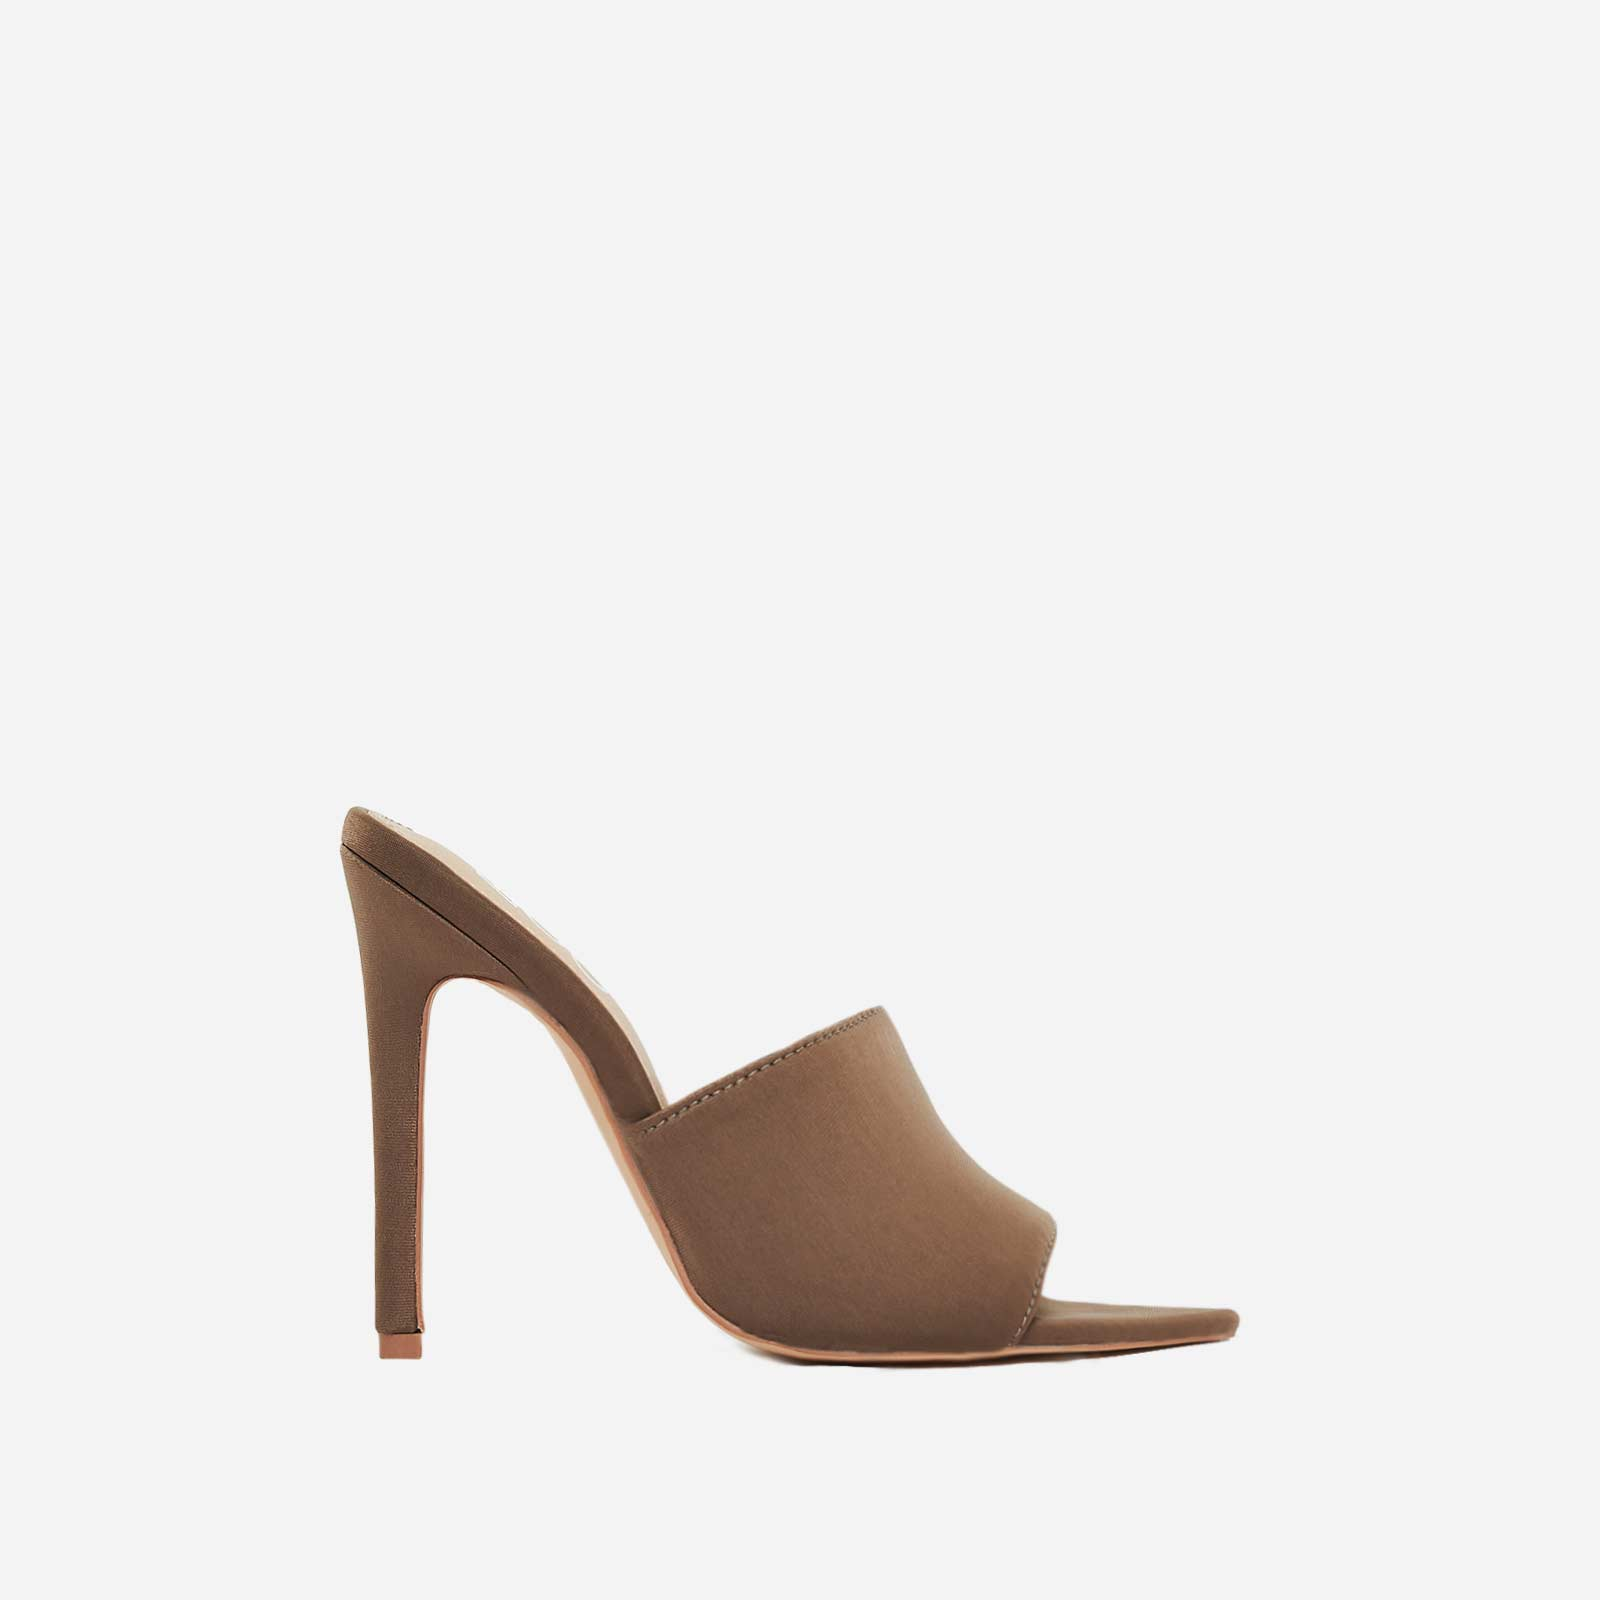 Briana Pointed Peep Toe Mule In Khaki Lycra